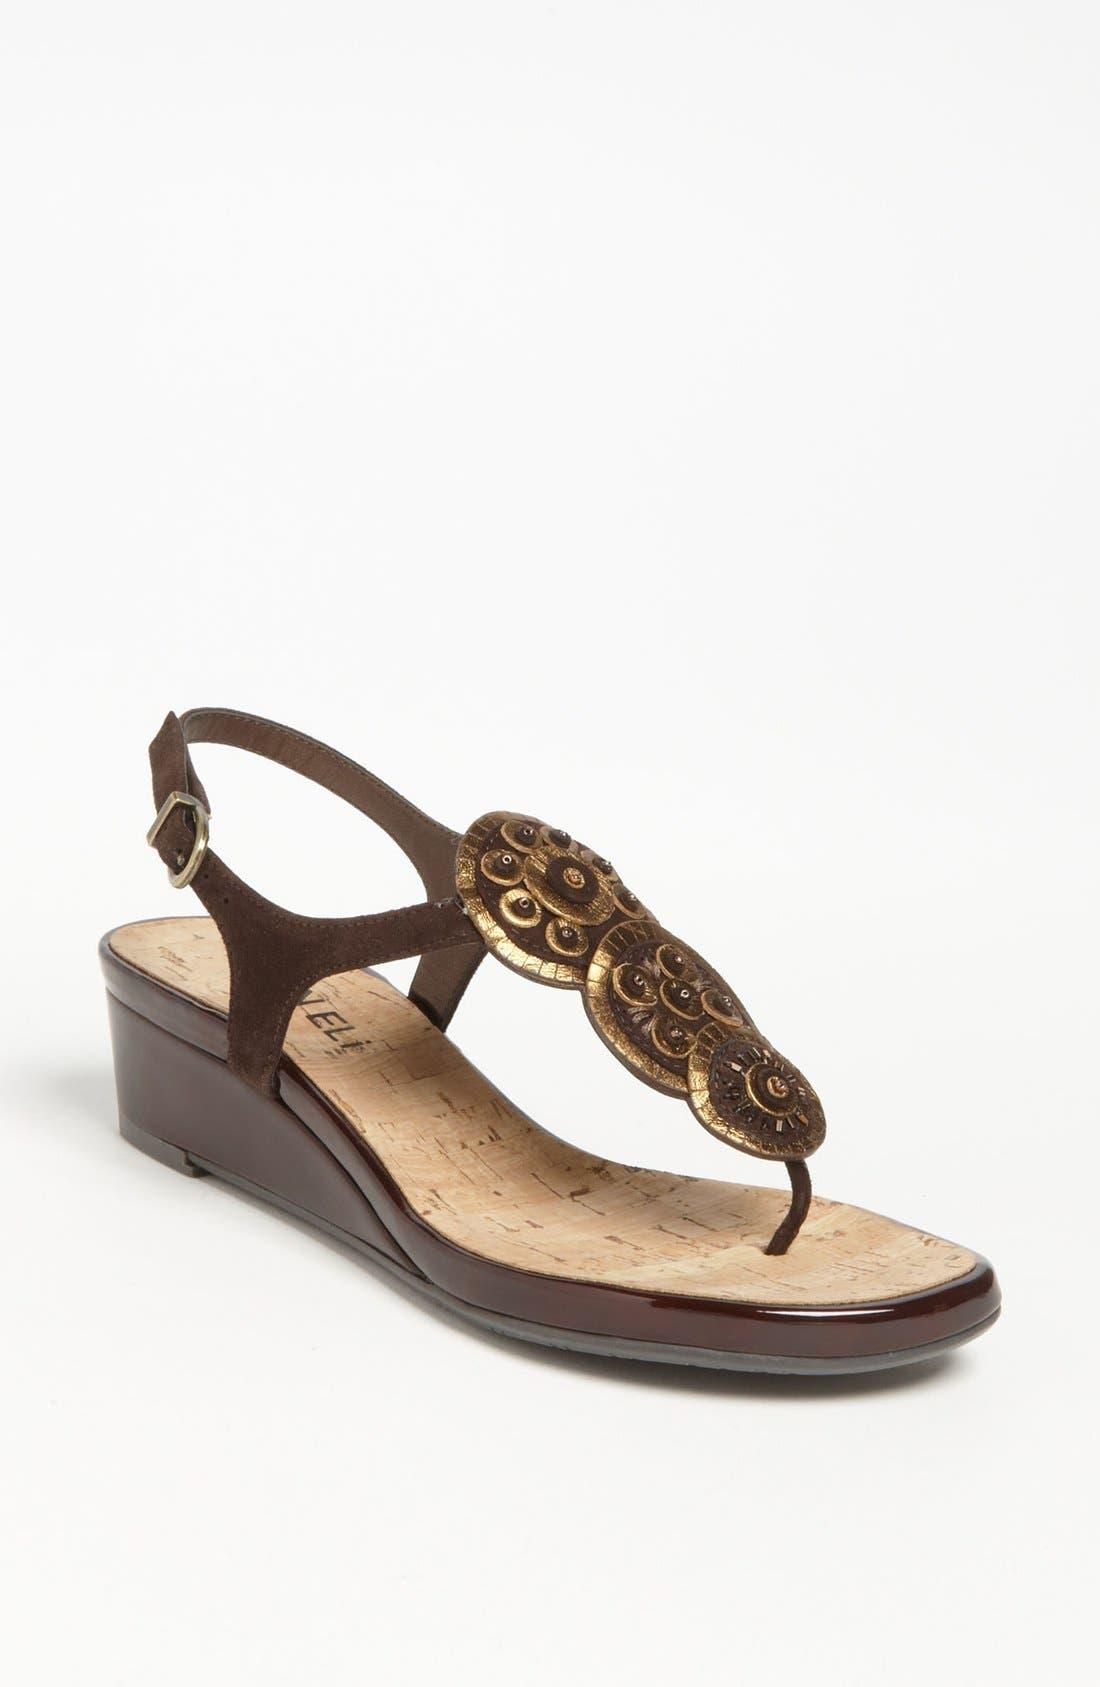 Alternate Image 1 Selected - VANELi 'Kalinda' Wedge Sandal